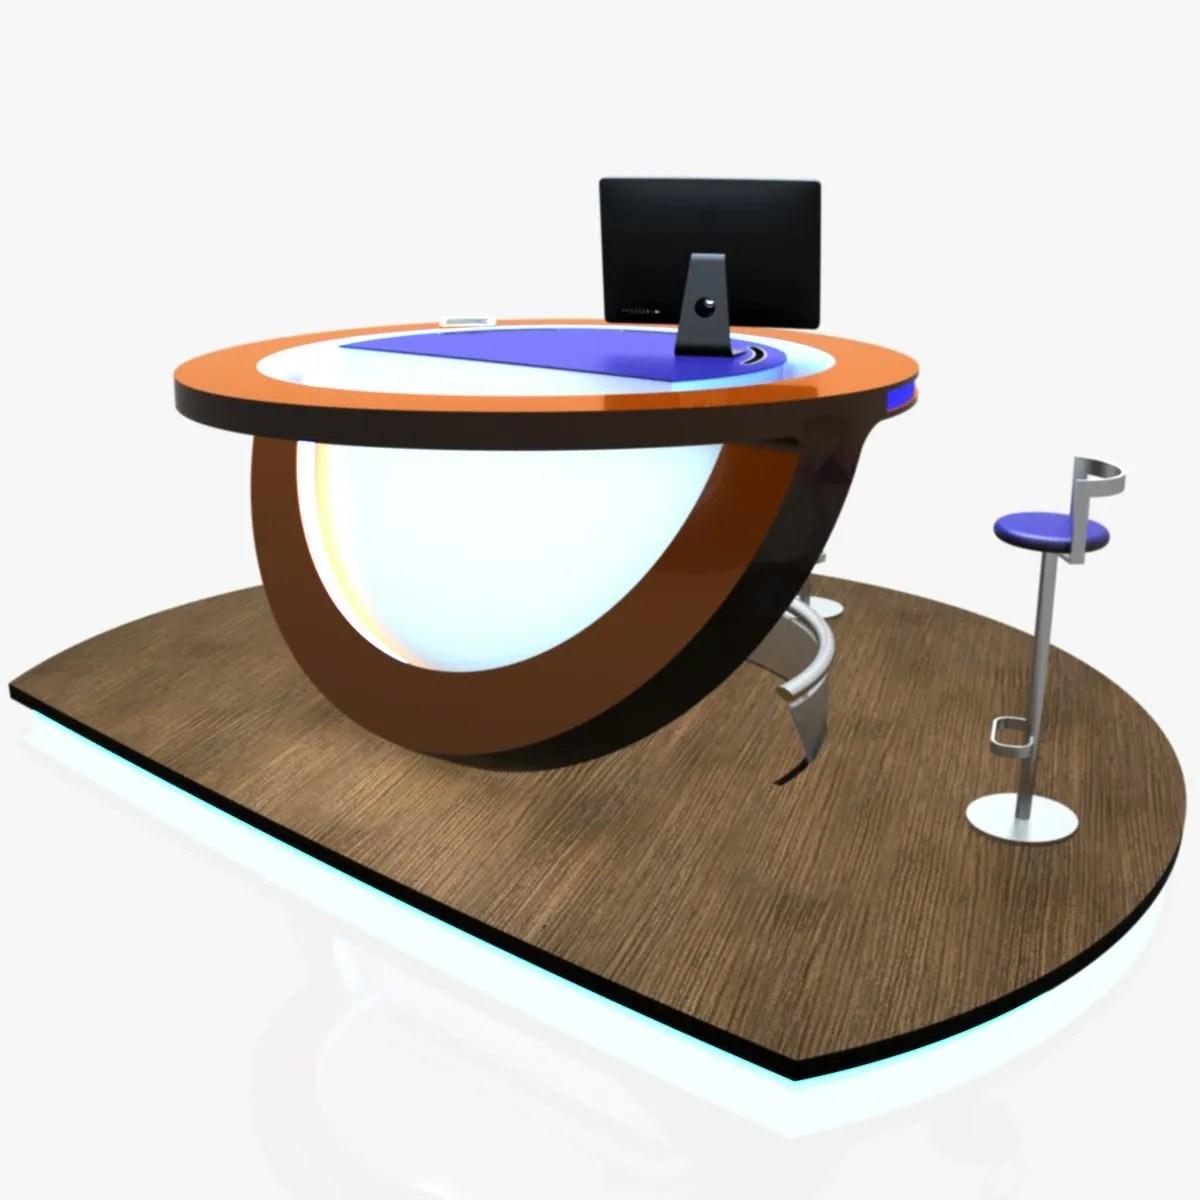 Virtual Tv Studio News Podium Desk Chair Imac27 Ip 3D